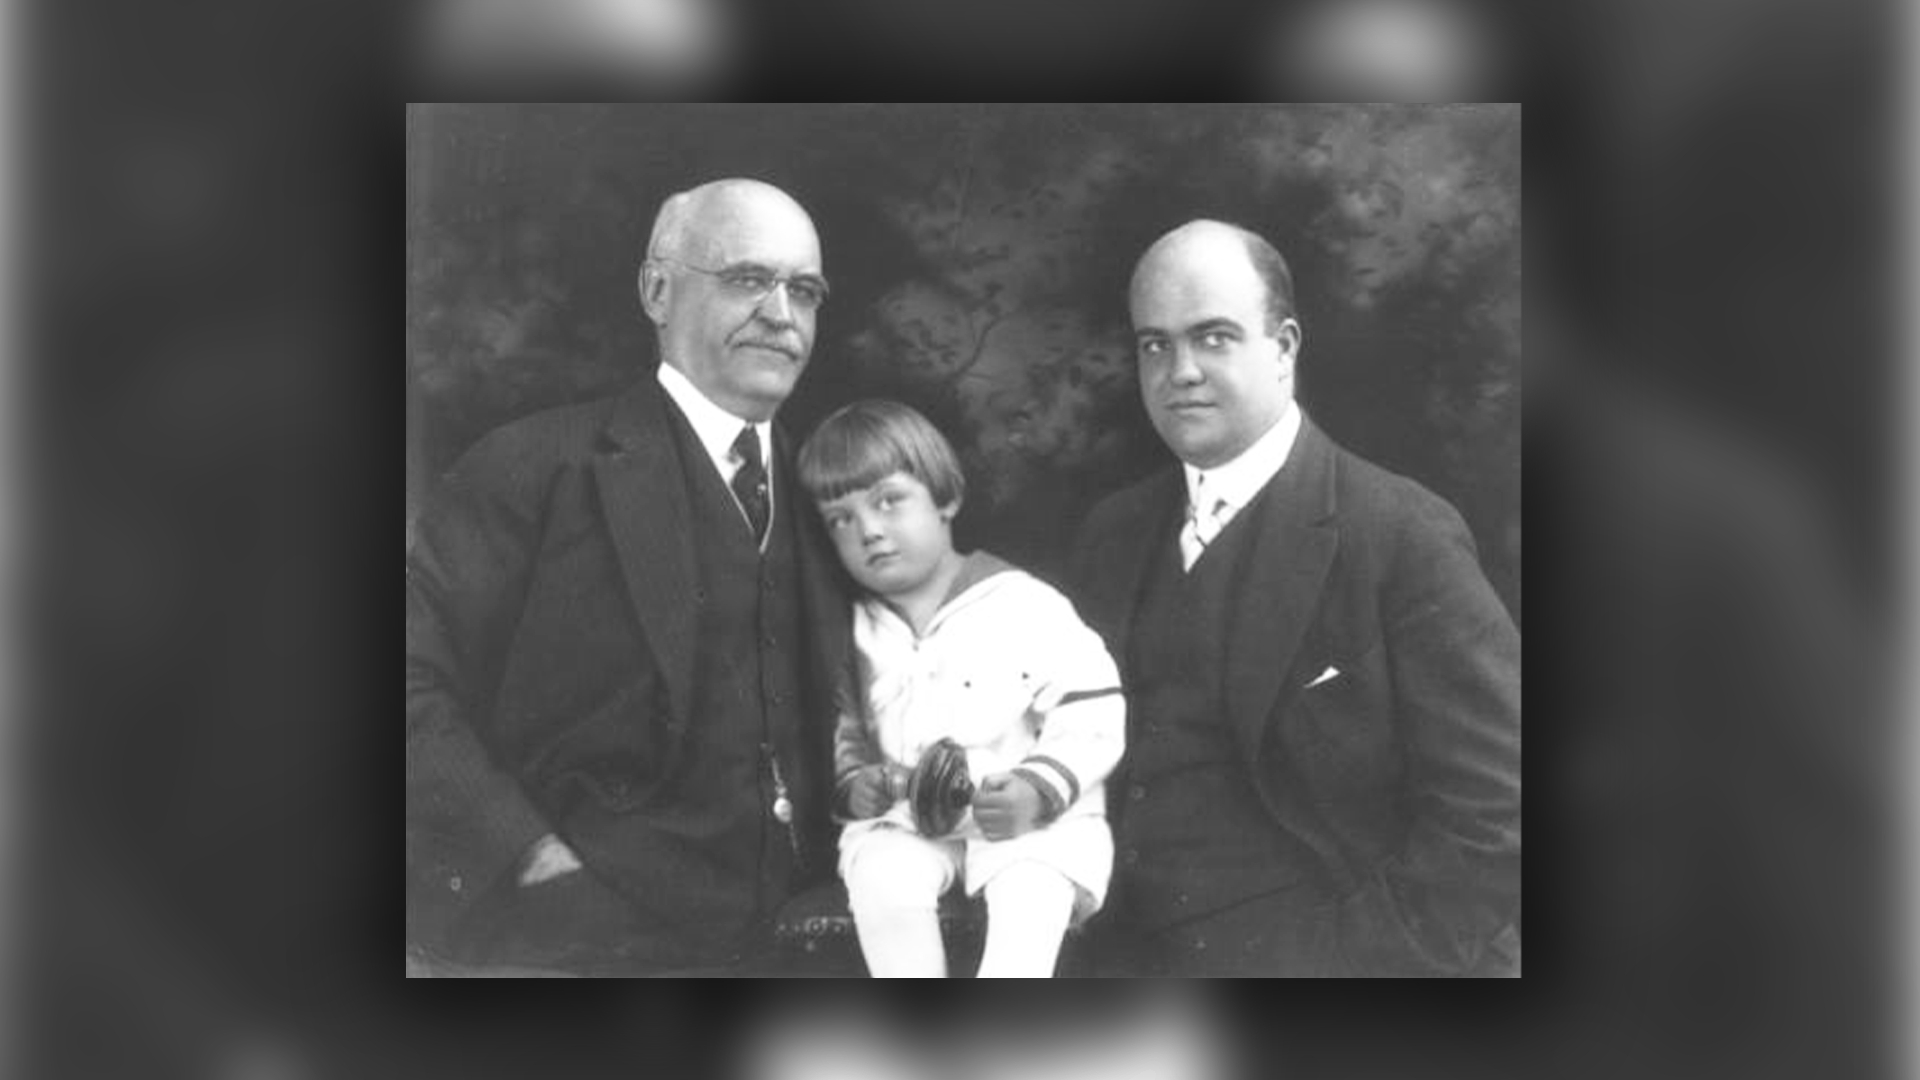 family photo with ew grove